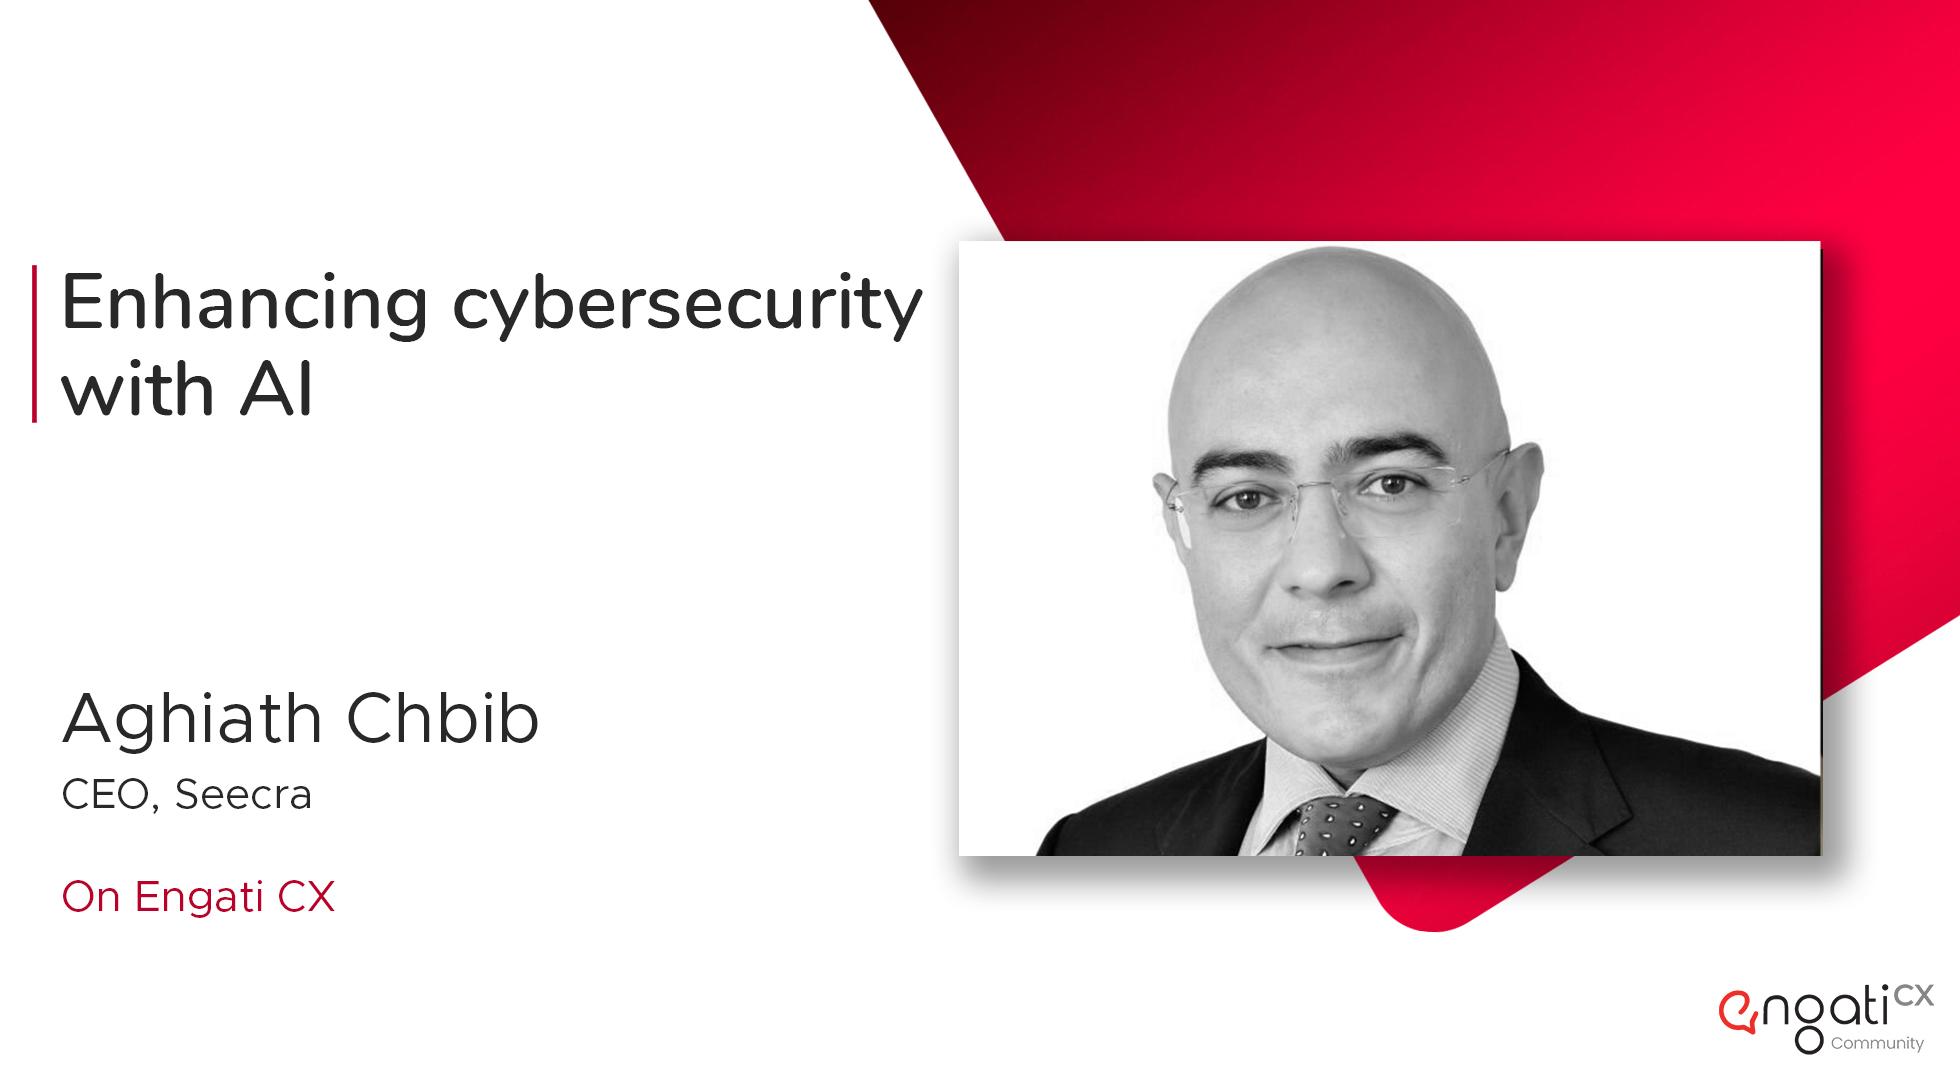 Enhancing cybersecurity with AI | Aghiath Chbib | Engati CX